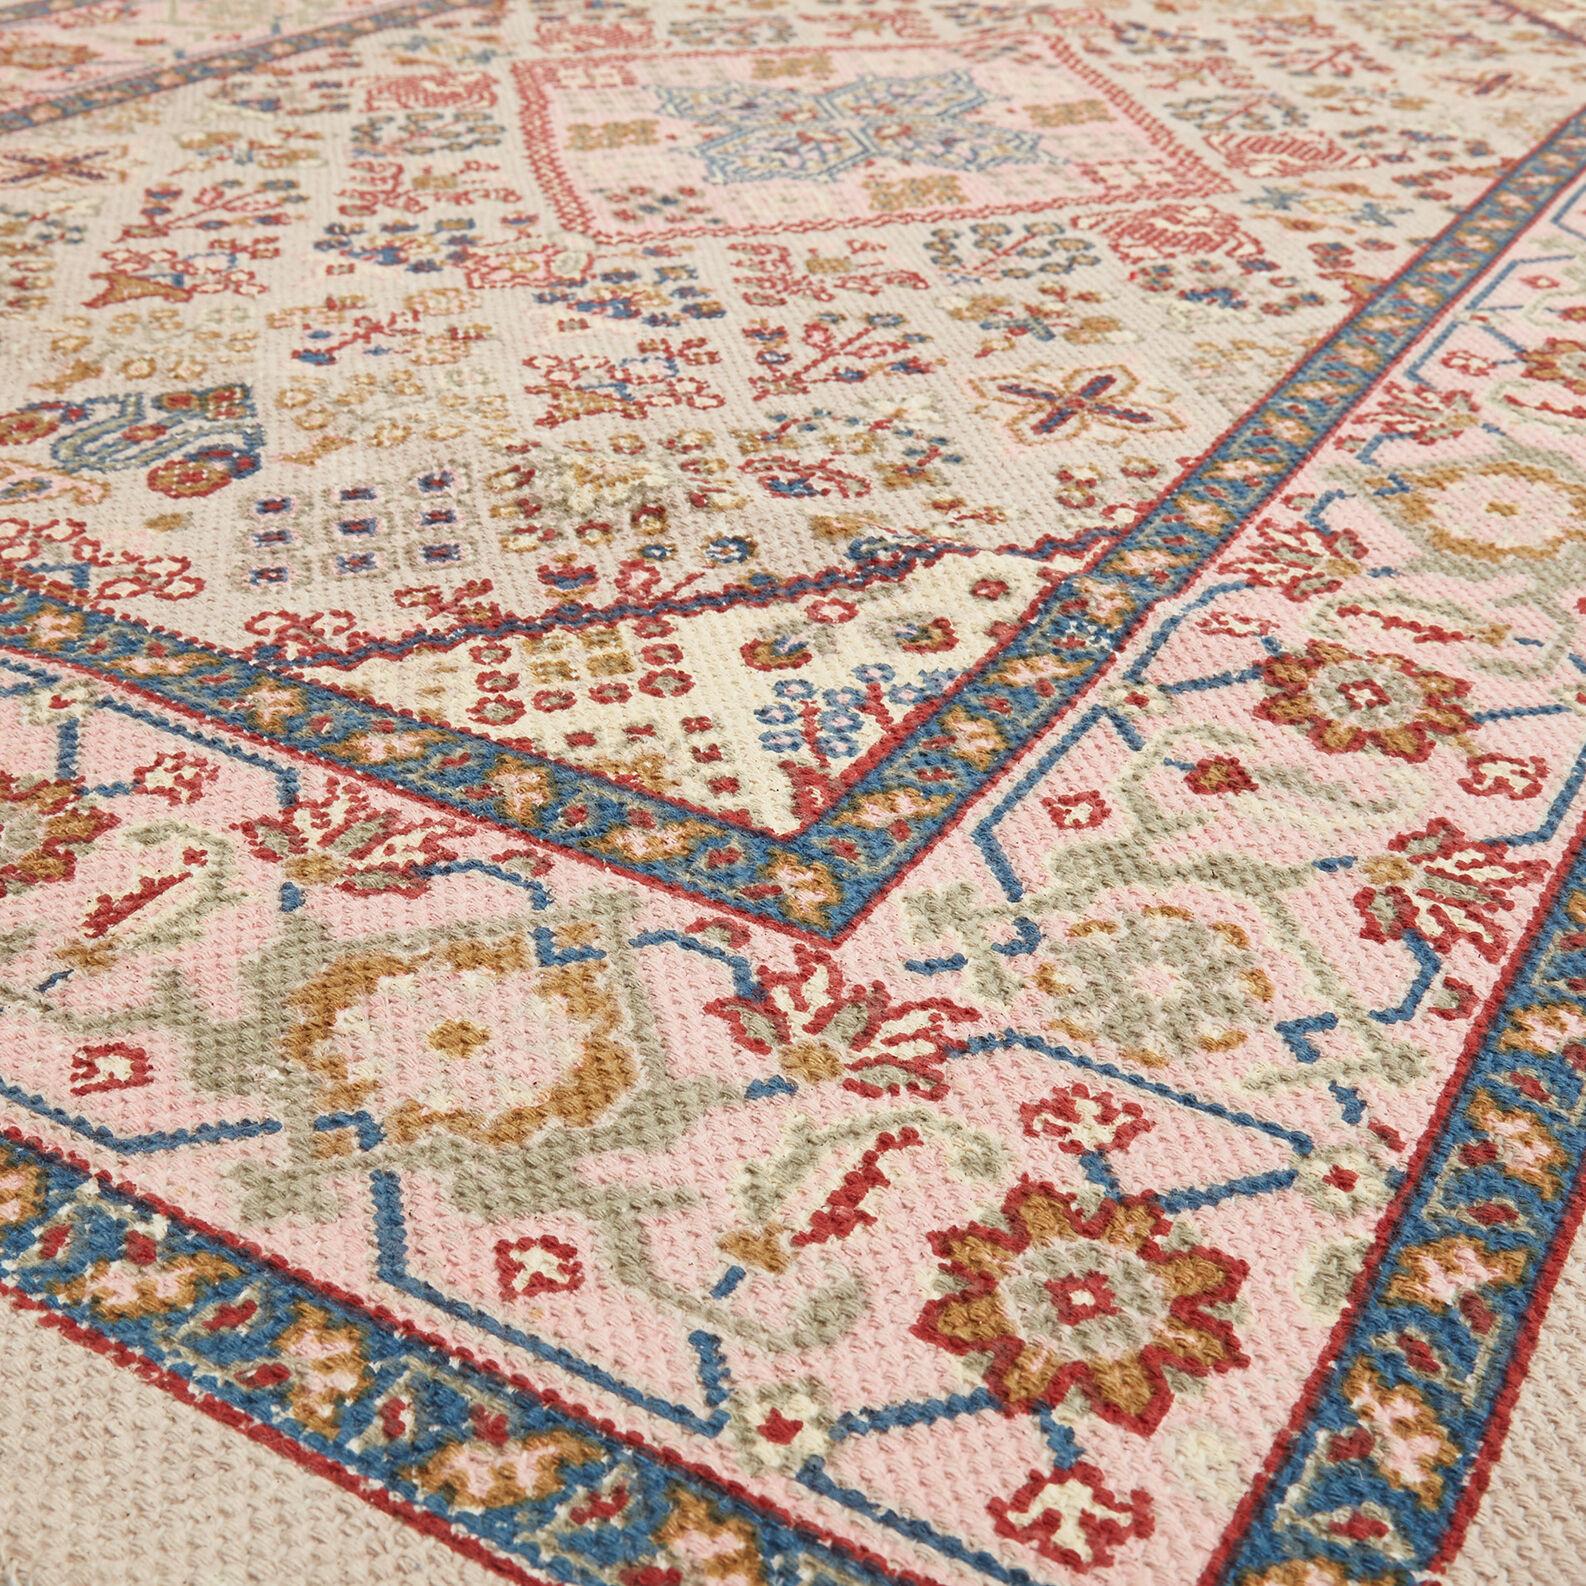 Hand-woven, printed cotton rug